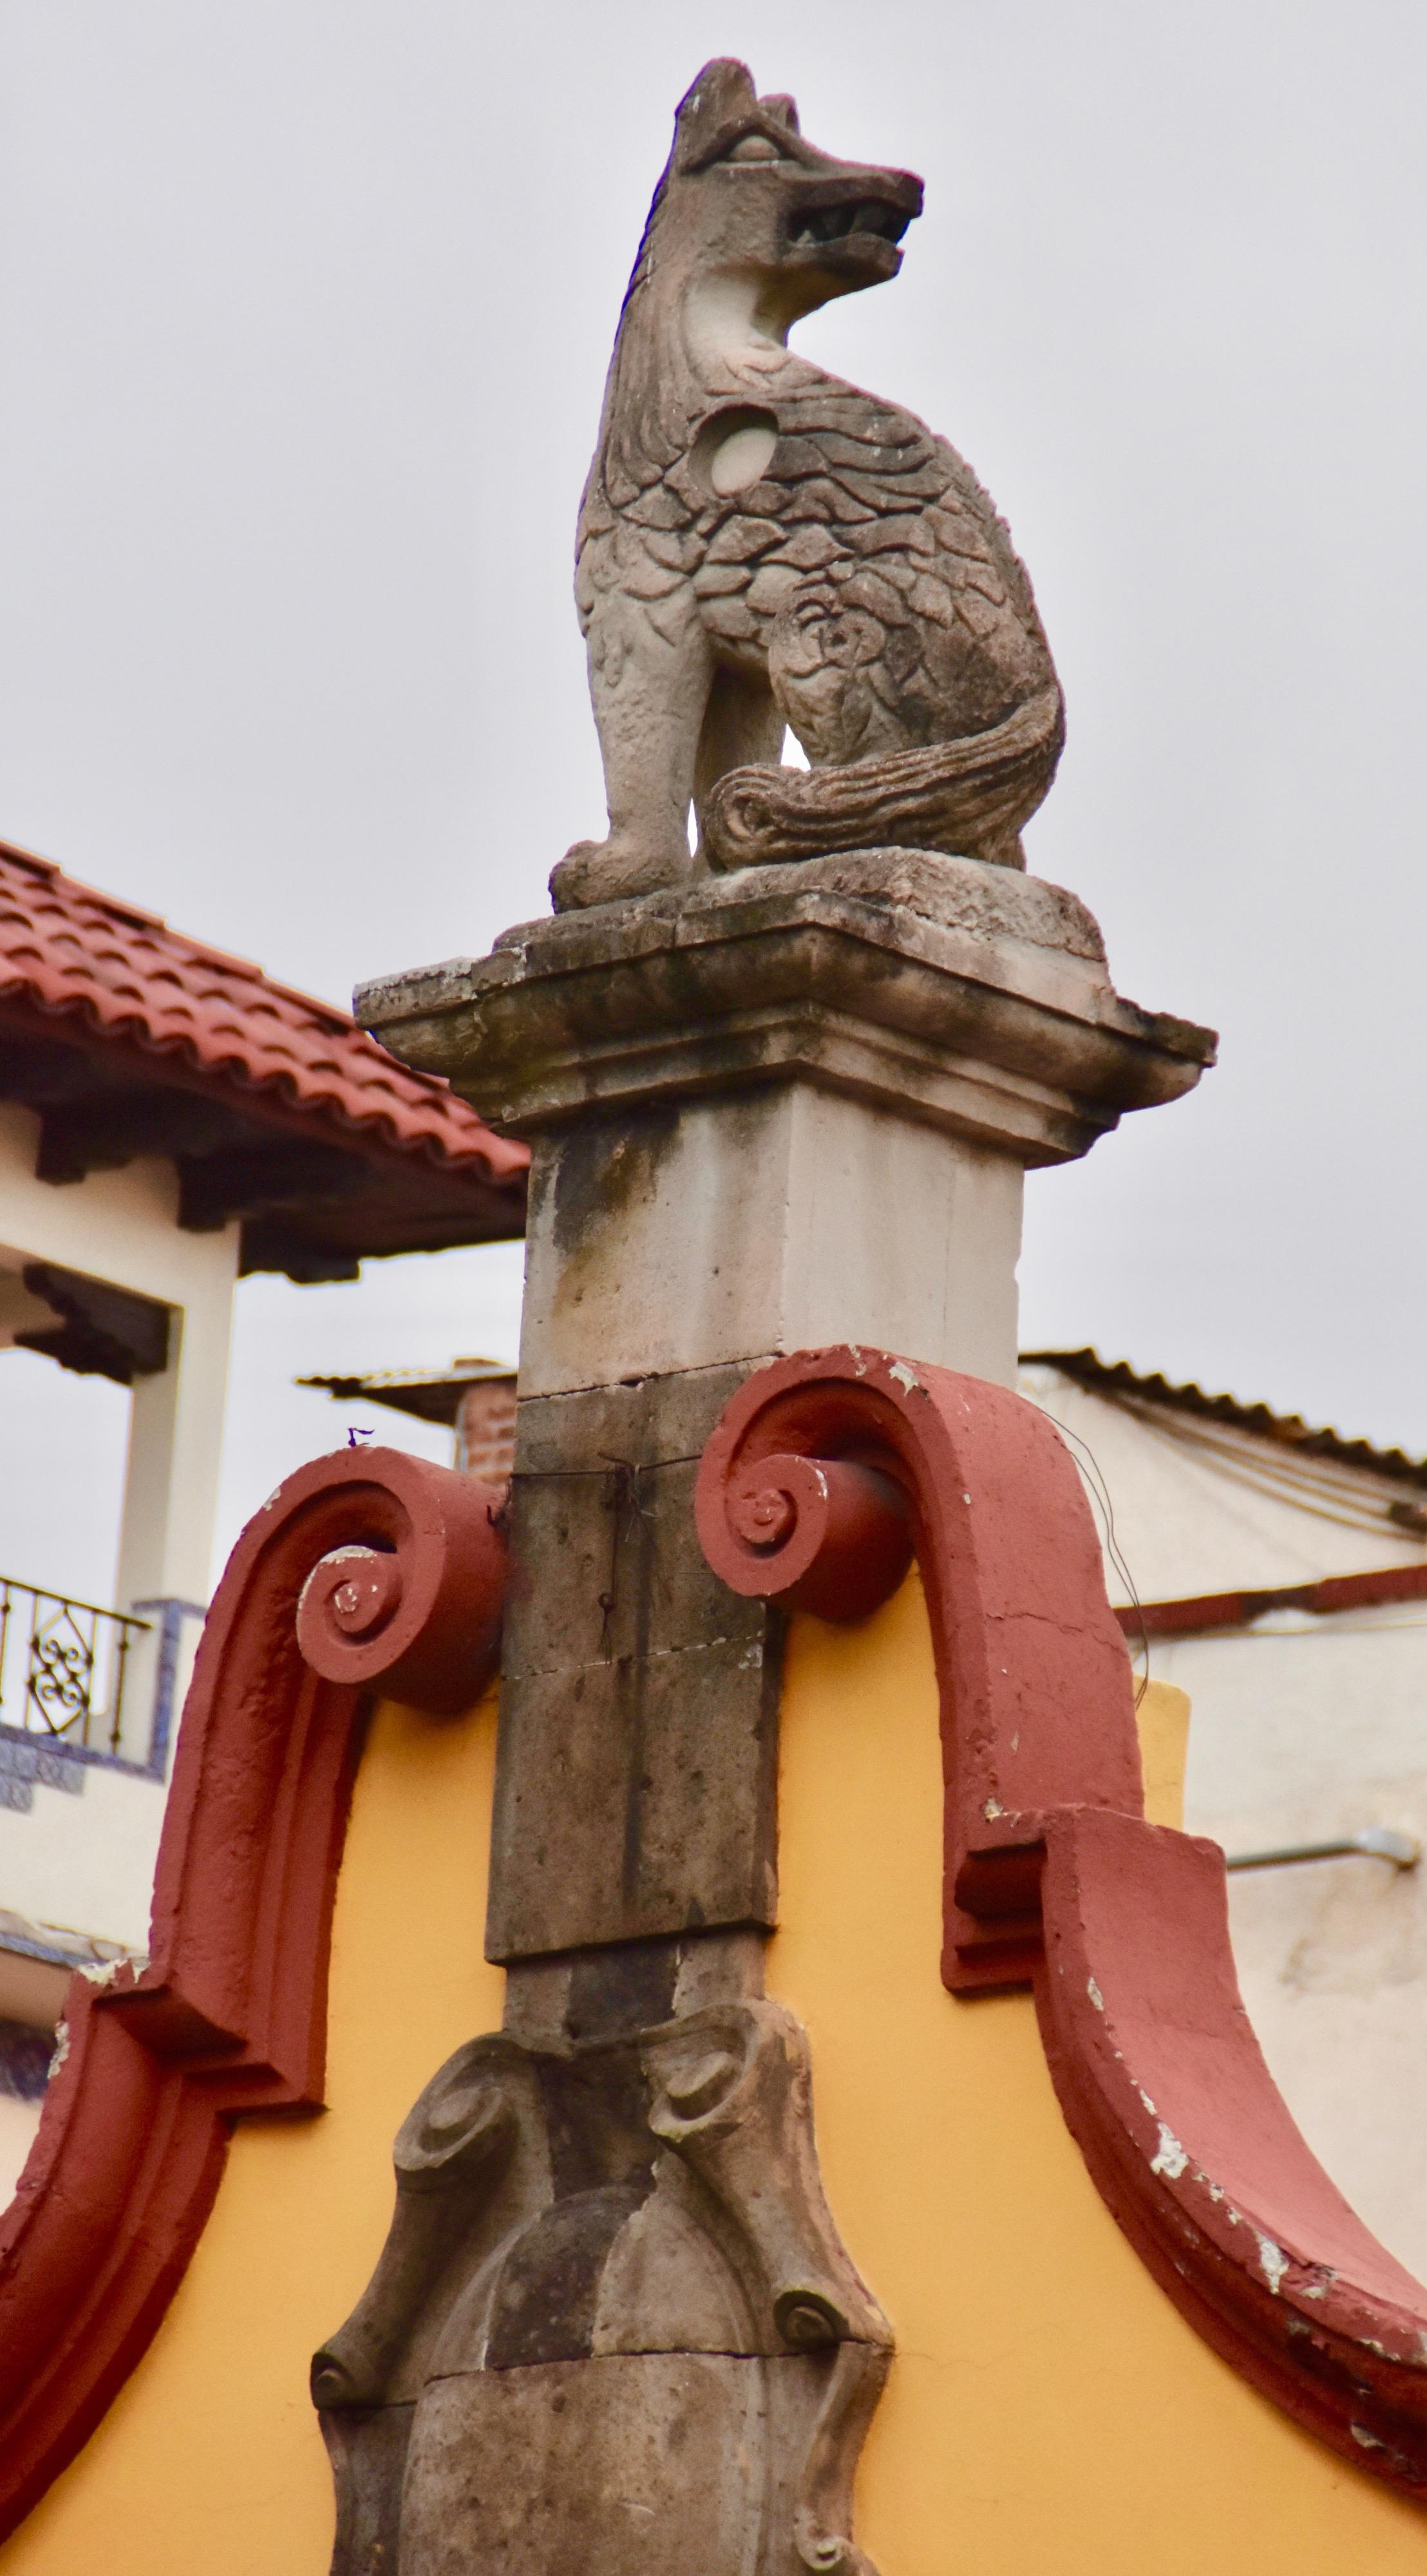 Rooftop Coyote, Coyoacan